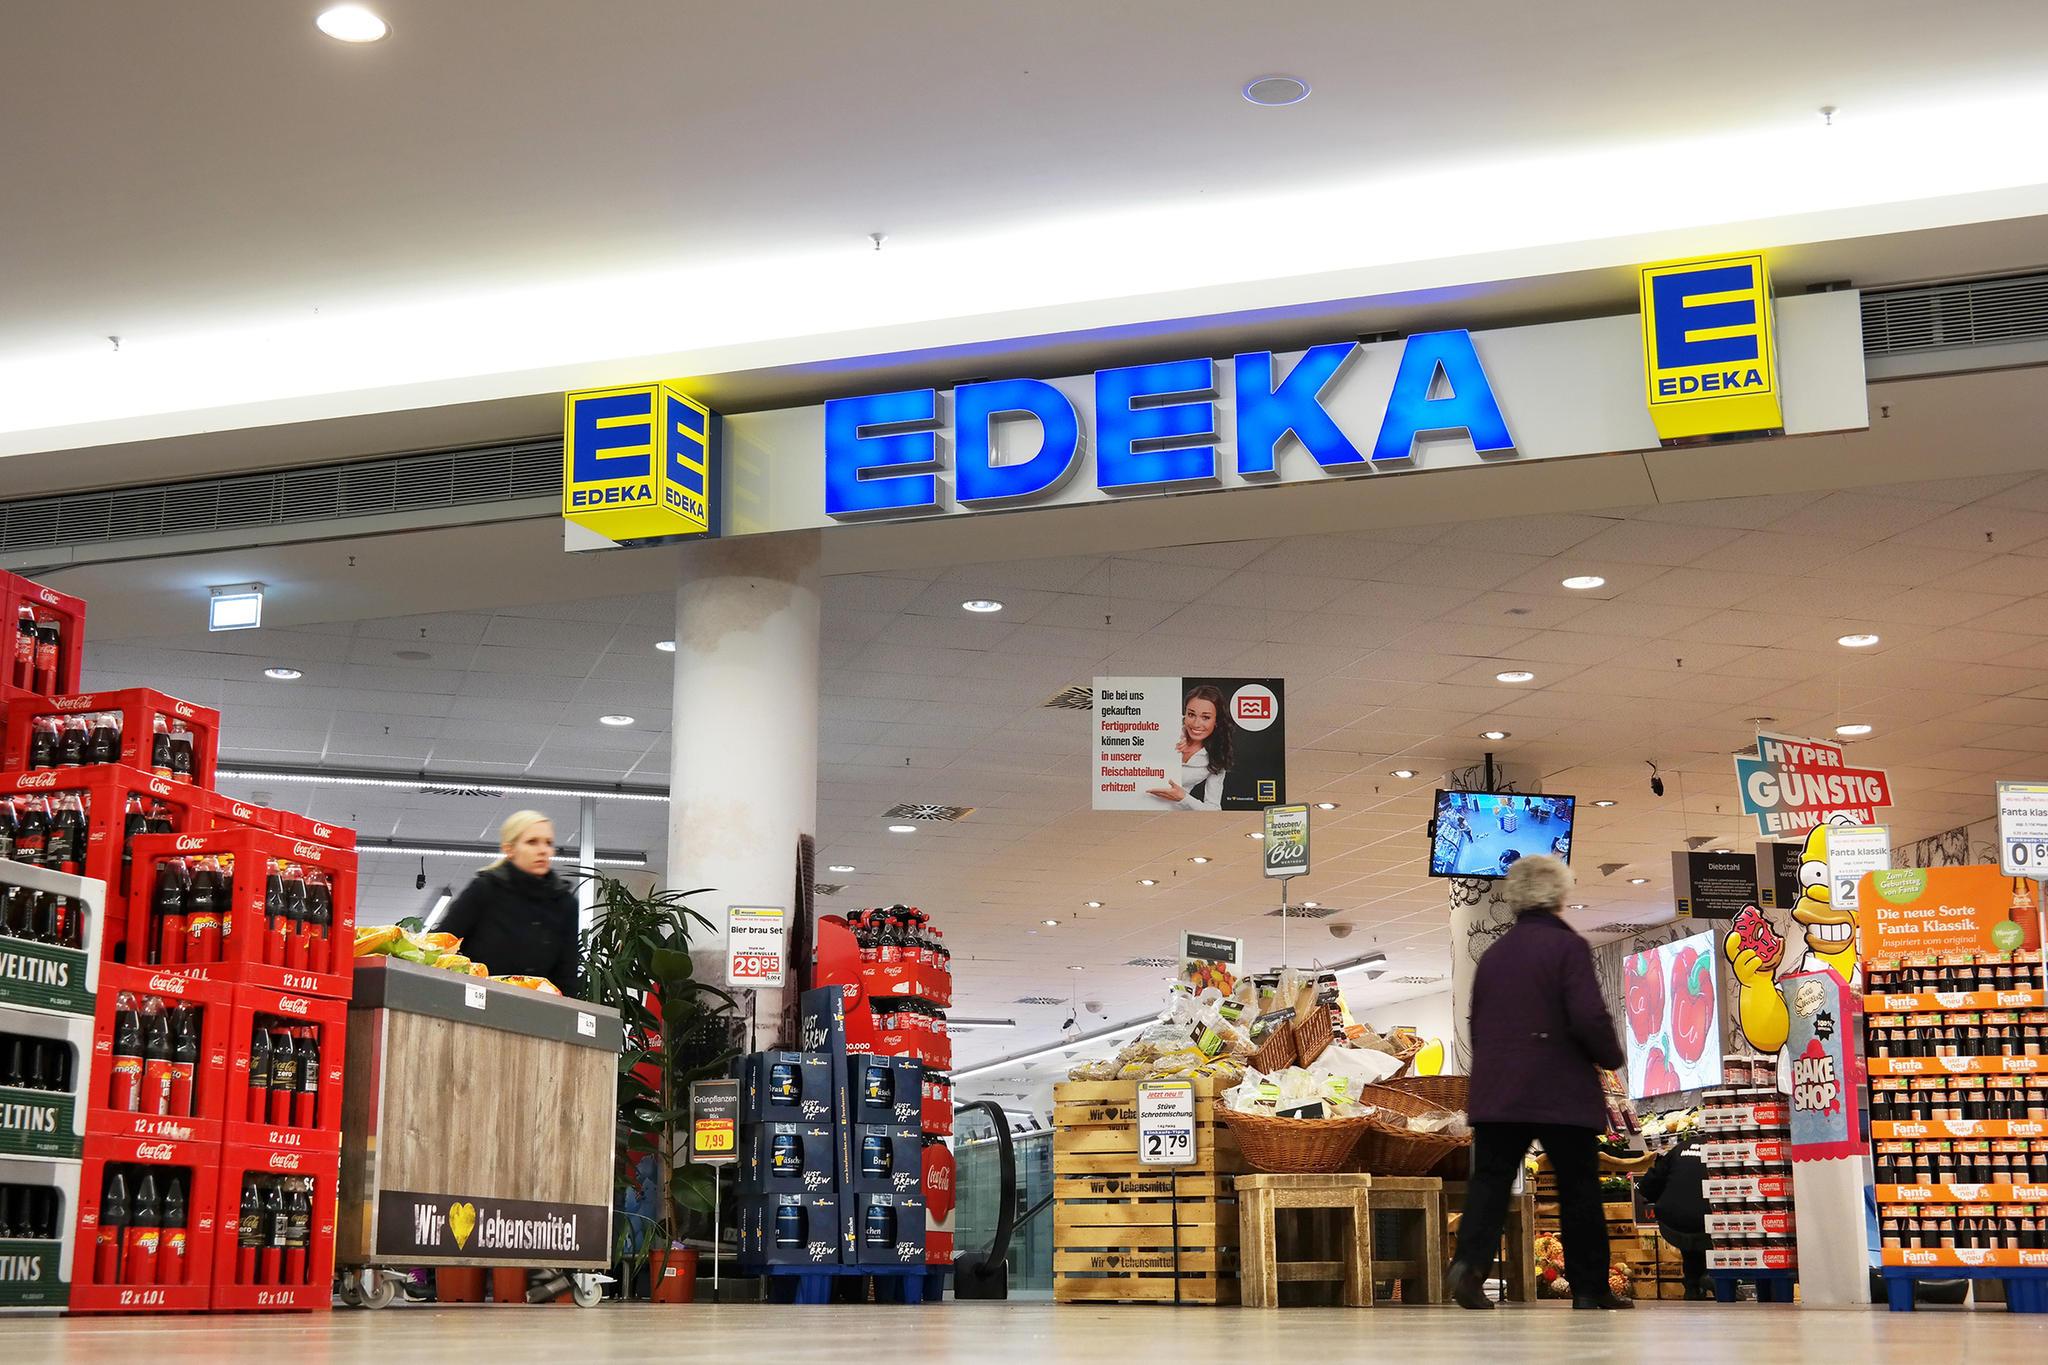 Rückruf wegen Metalldraht: Edeka warnt vor Aufback-Baguettes | Wirtschaft